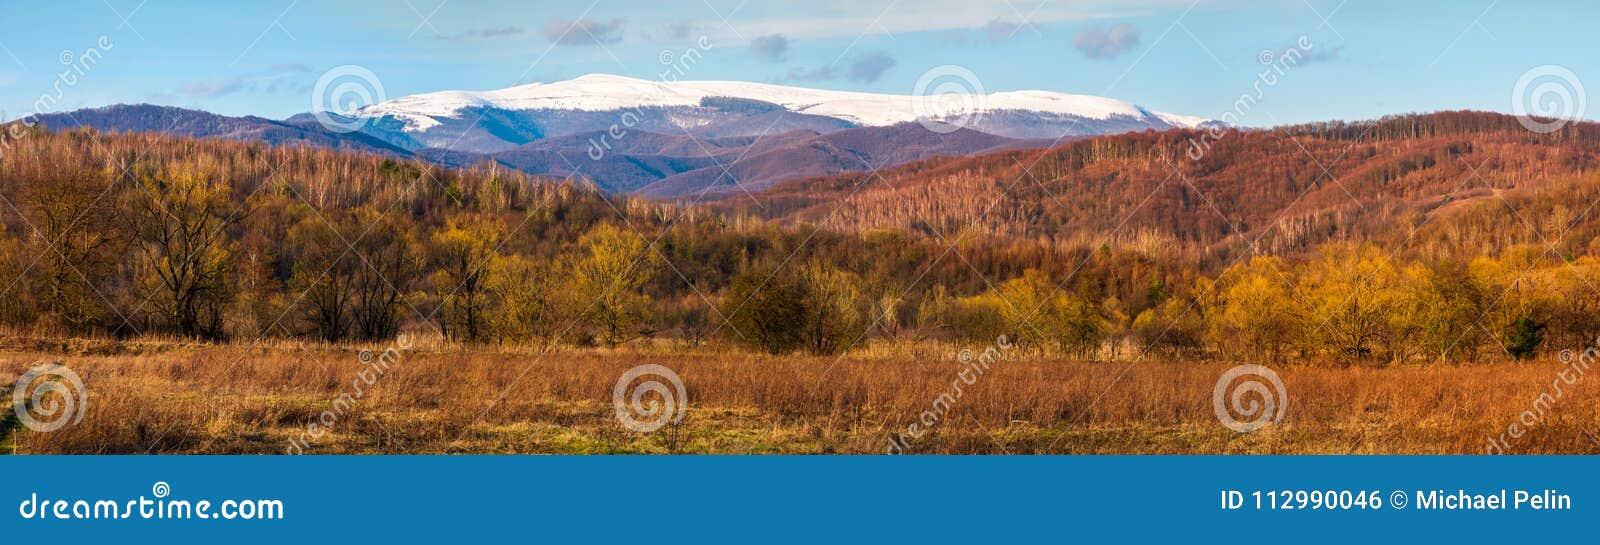 Springtime countryside with snowy mountain